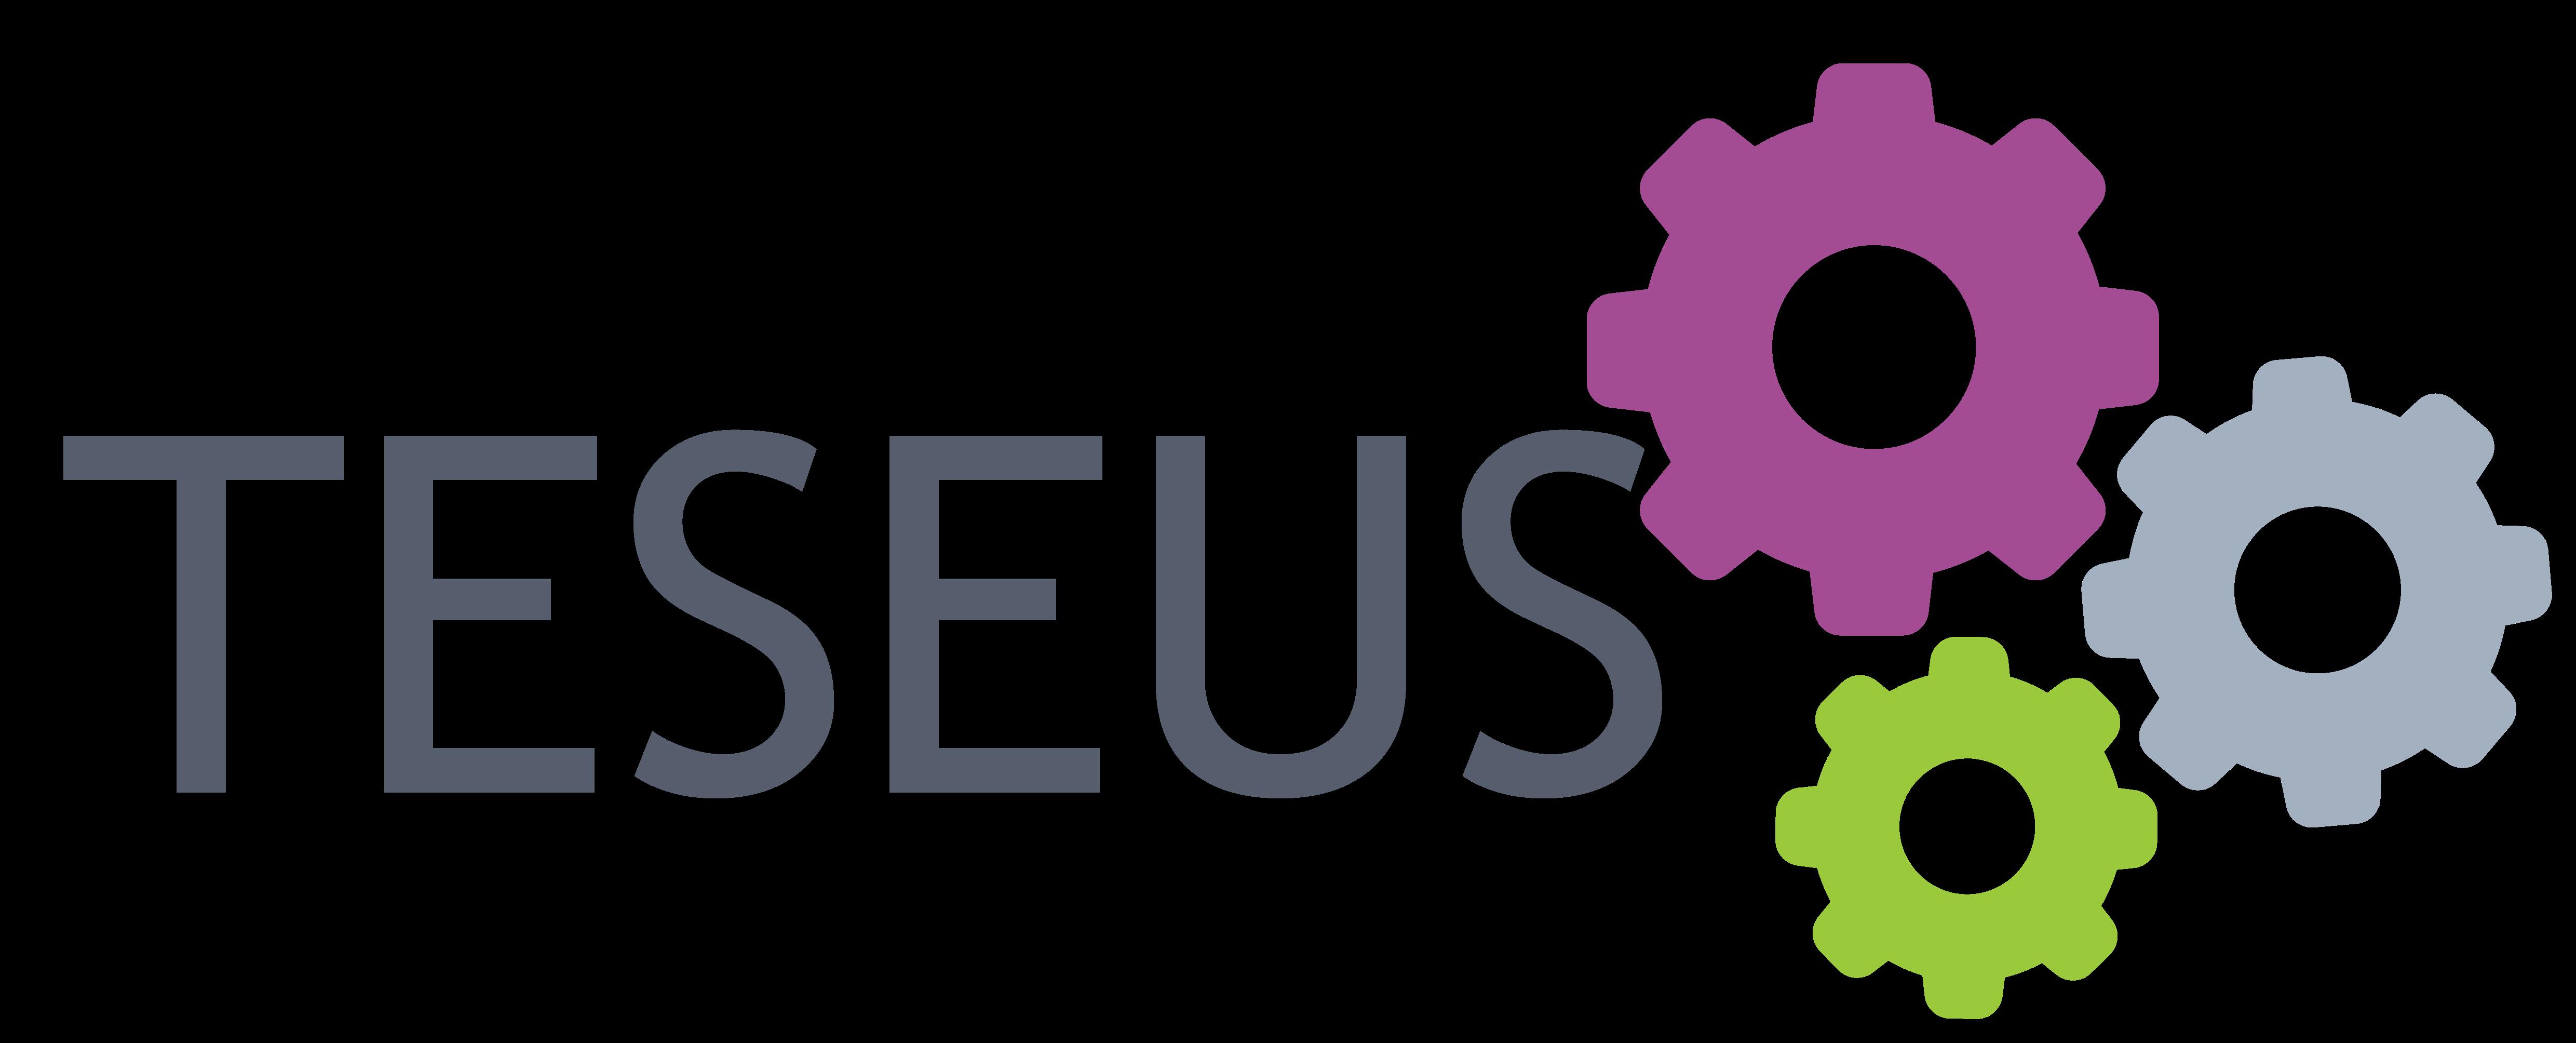 Kick-off Meeting en Bruselas, proyecto TESEUS